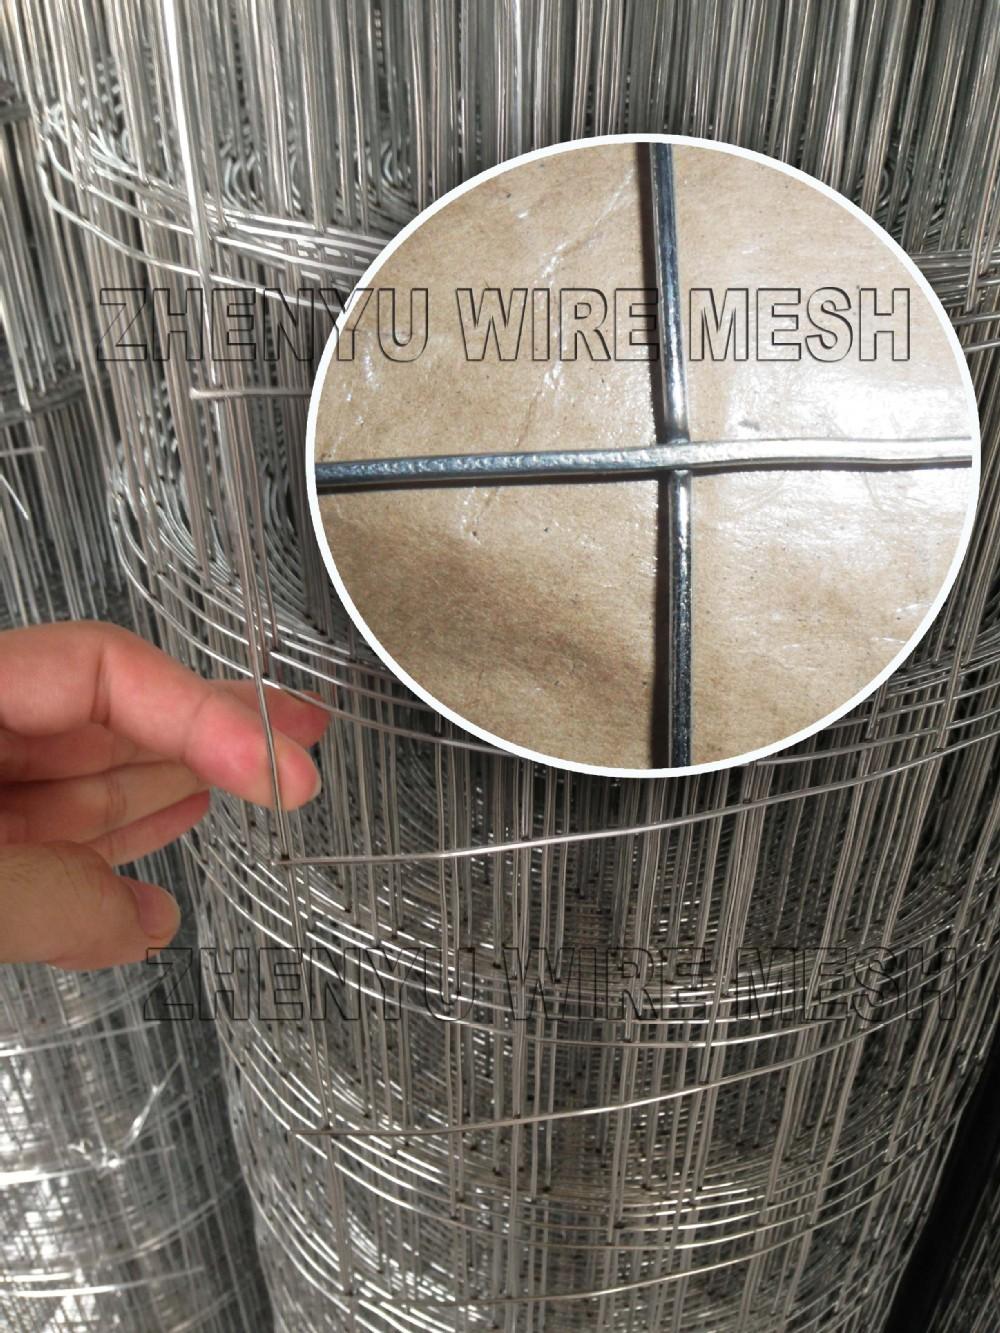 Brc 3315 Roof Mesh - Buy Welded Wire Mesh 3315,Brc 3315,3315 Wire ...